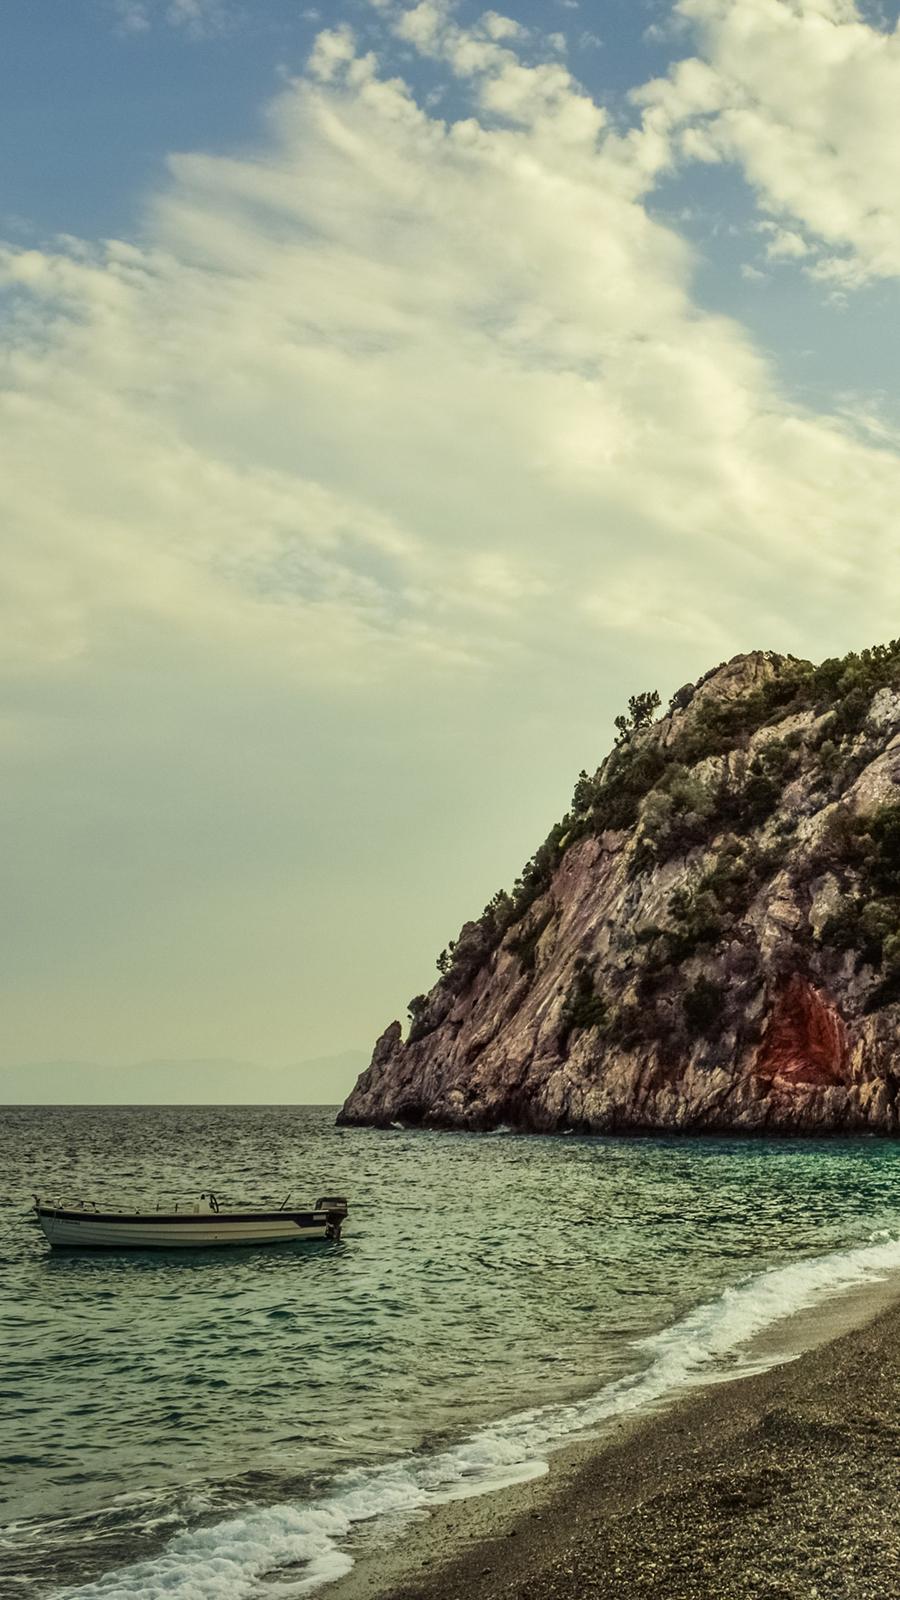 Sea, Rock, Boat, Shore Wallpapers Download